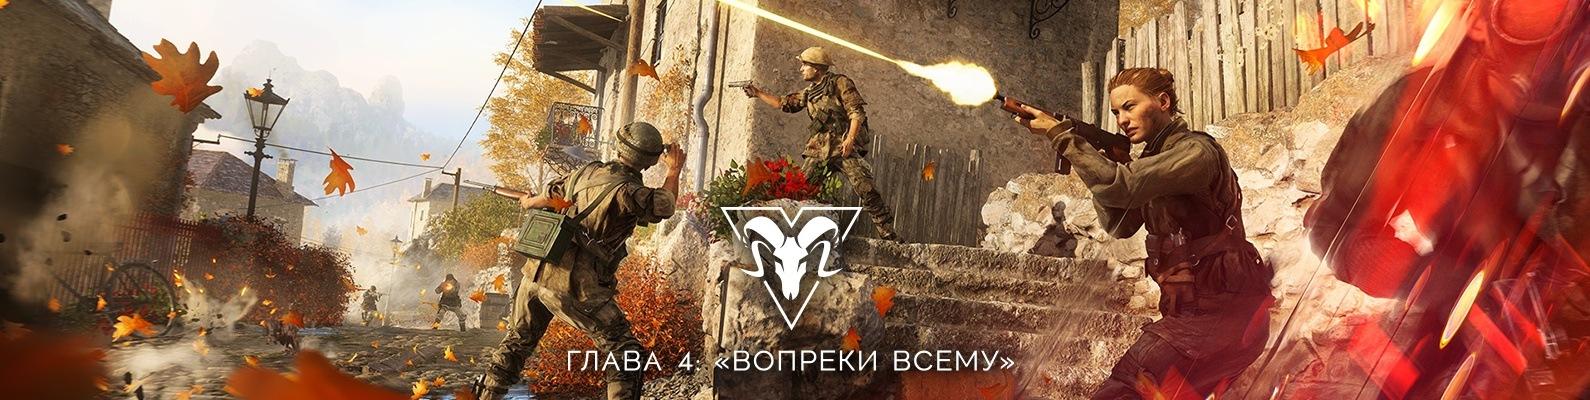 Battlefield | ВКонтакте